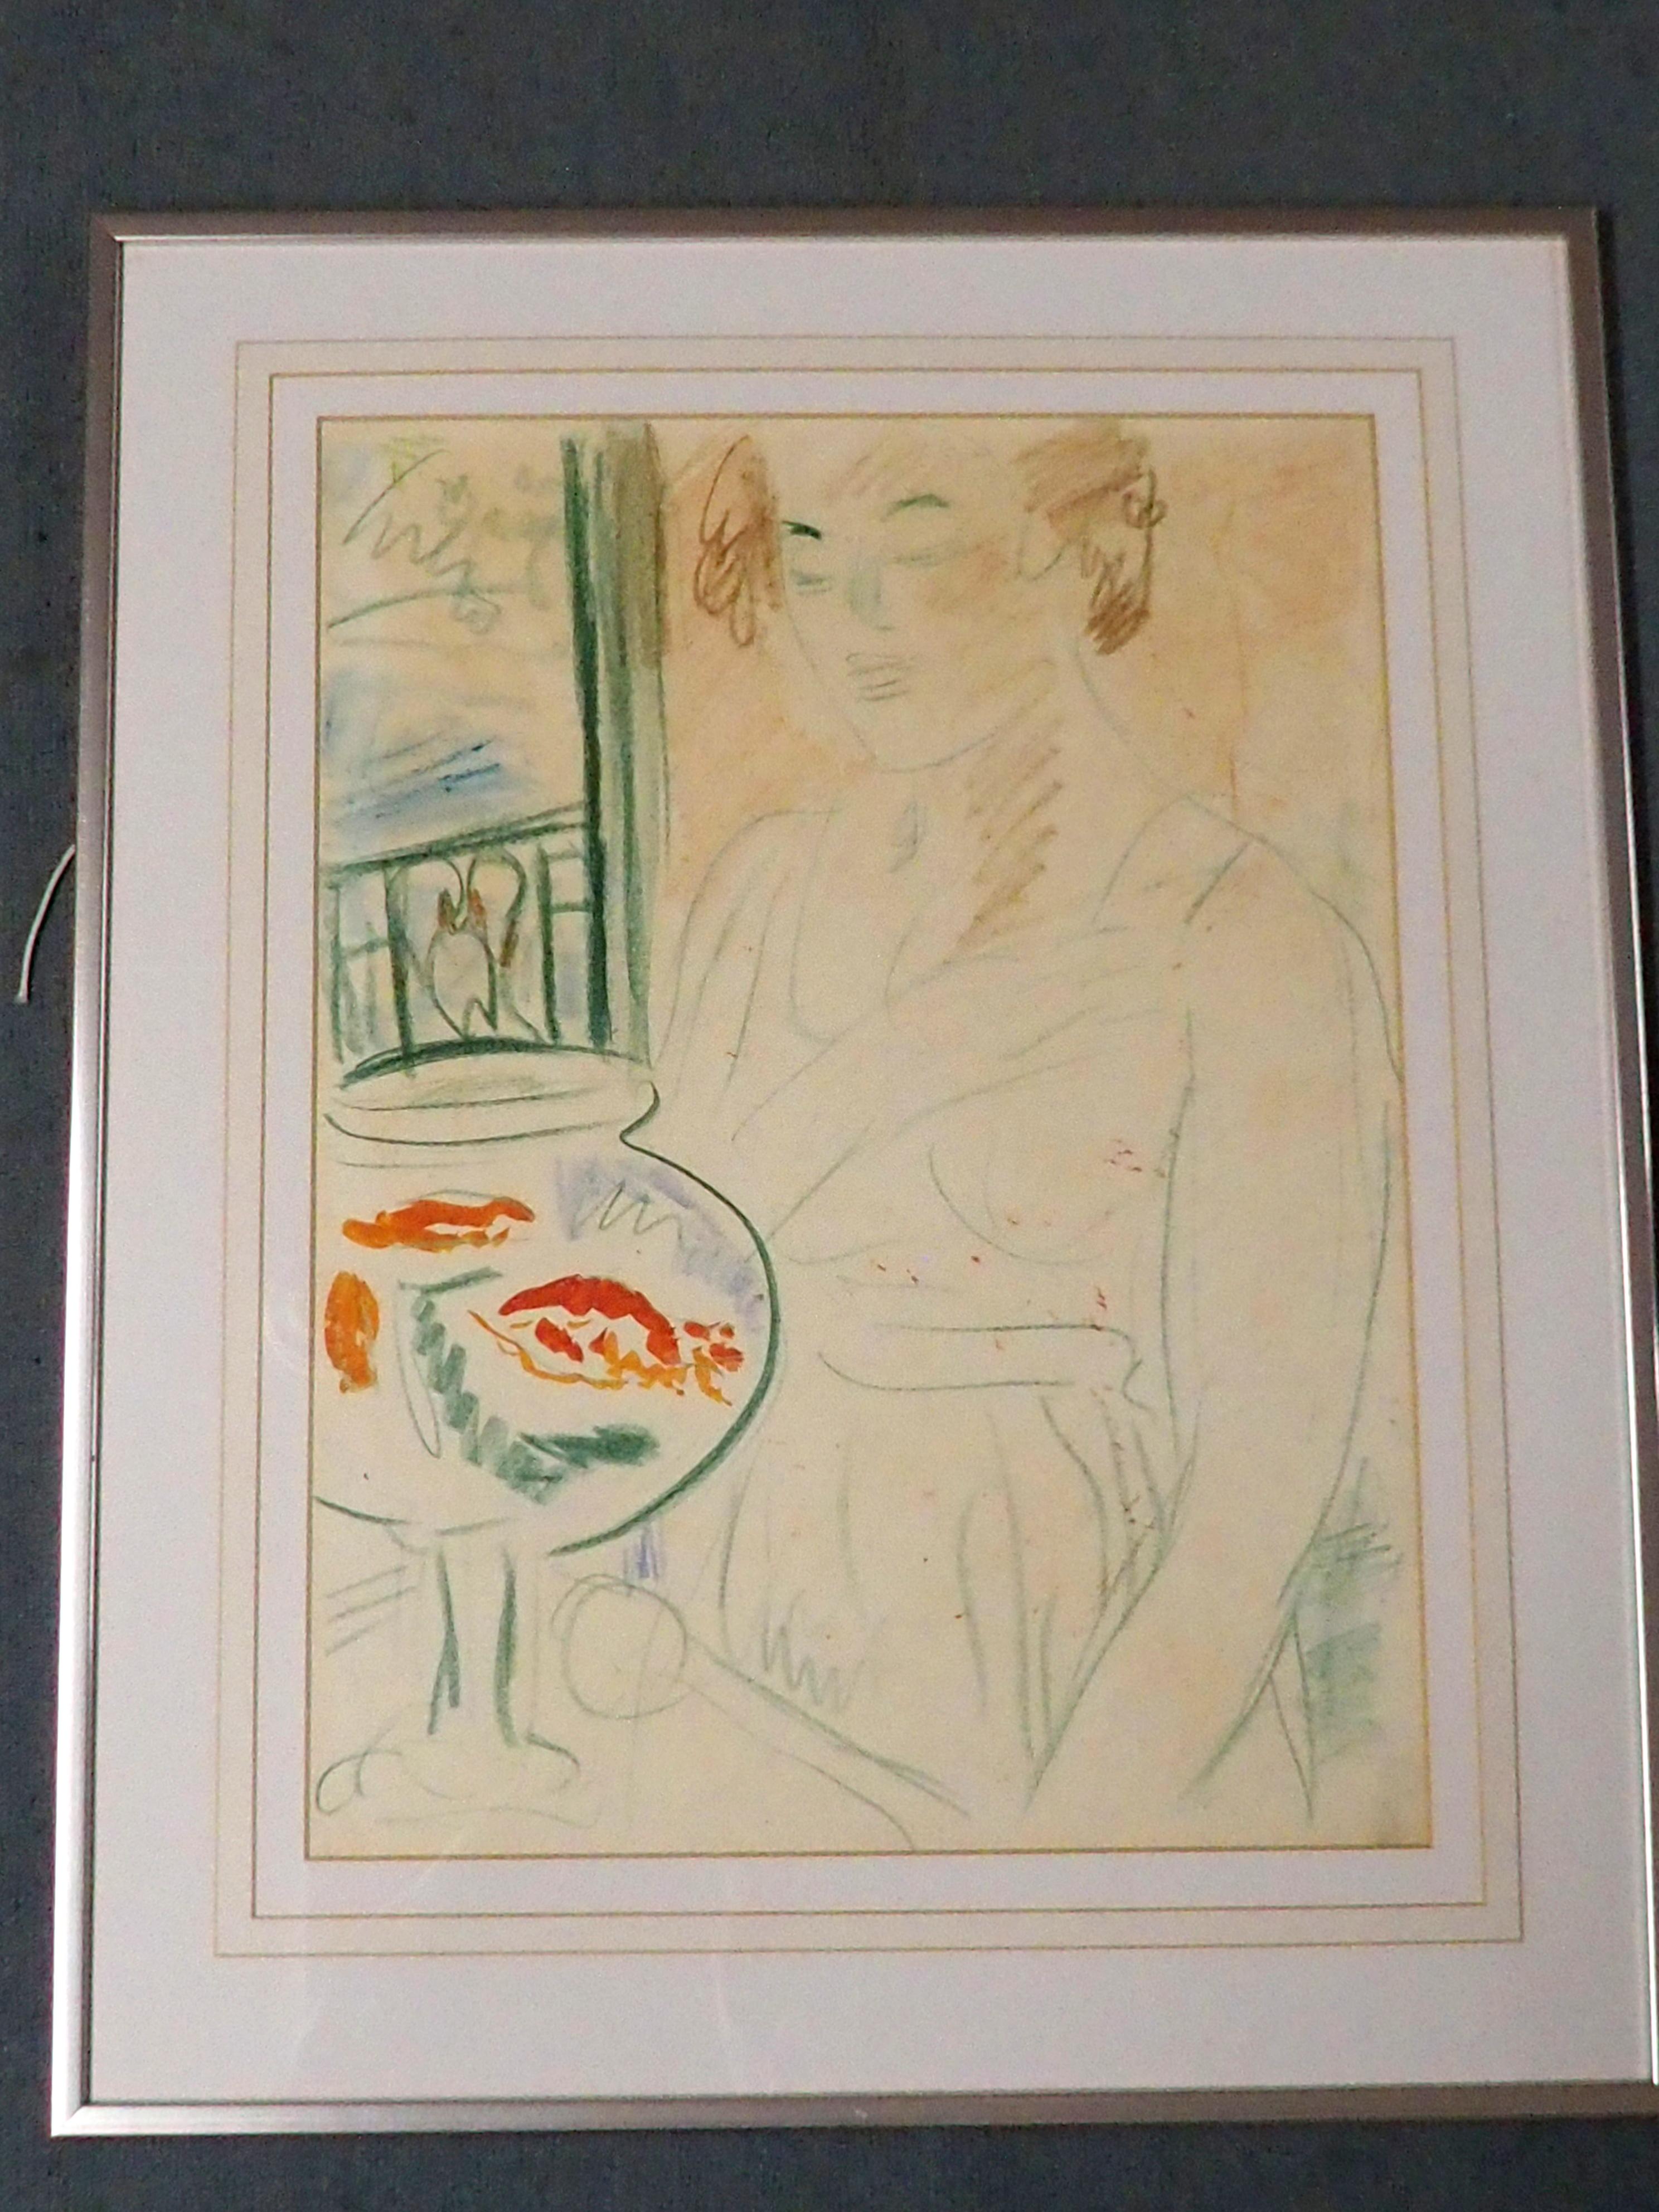 GEORGE LESLIE HUNTER (SCOTTISH 1877-1931) THE GOLDFISH BOWL colour crayon, 58 x 43cm William - Image 2 of 3